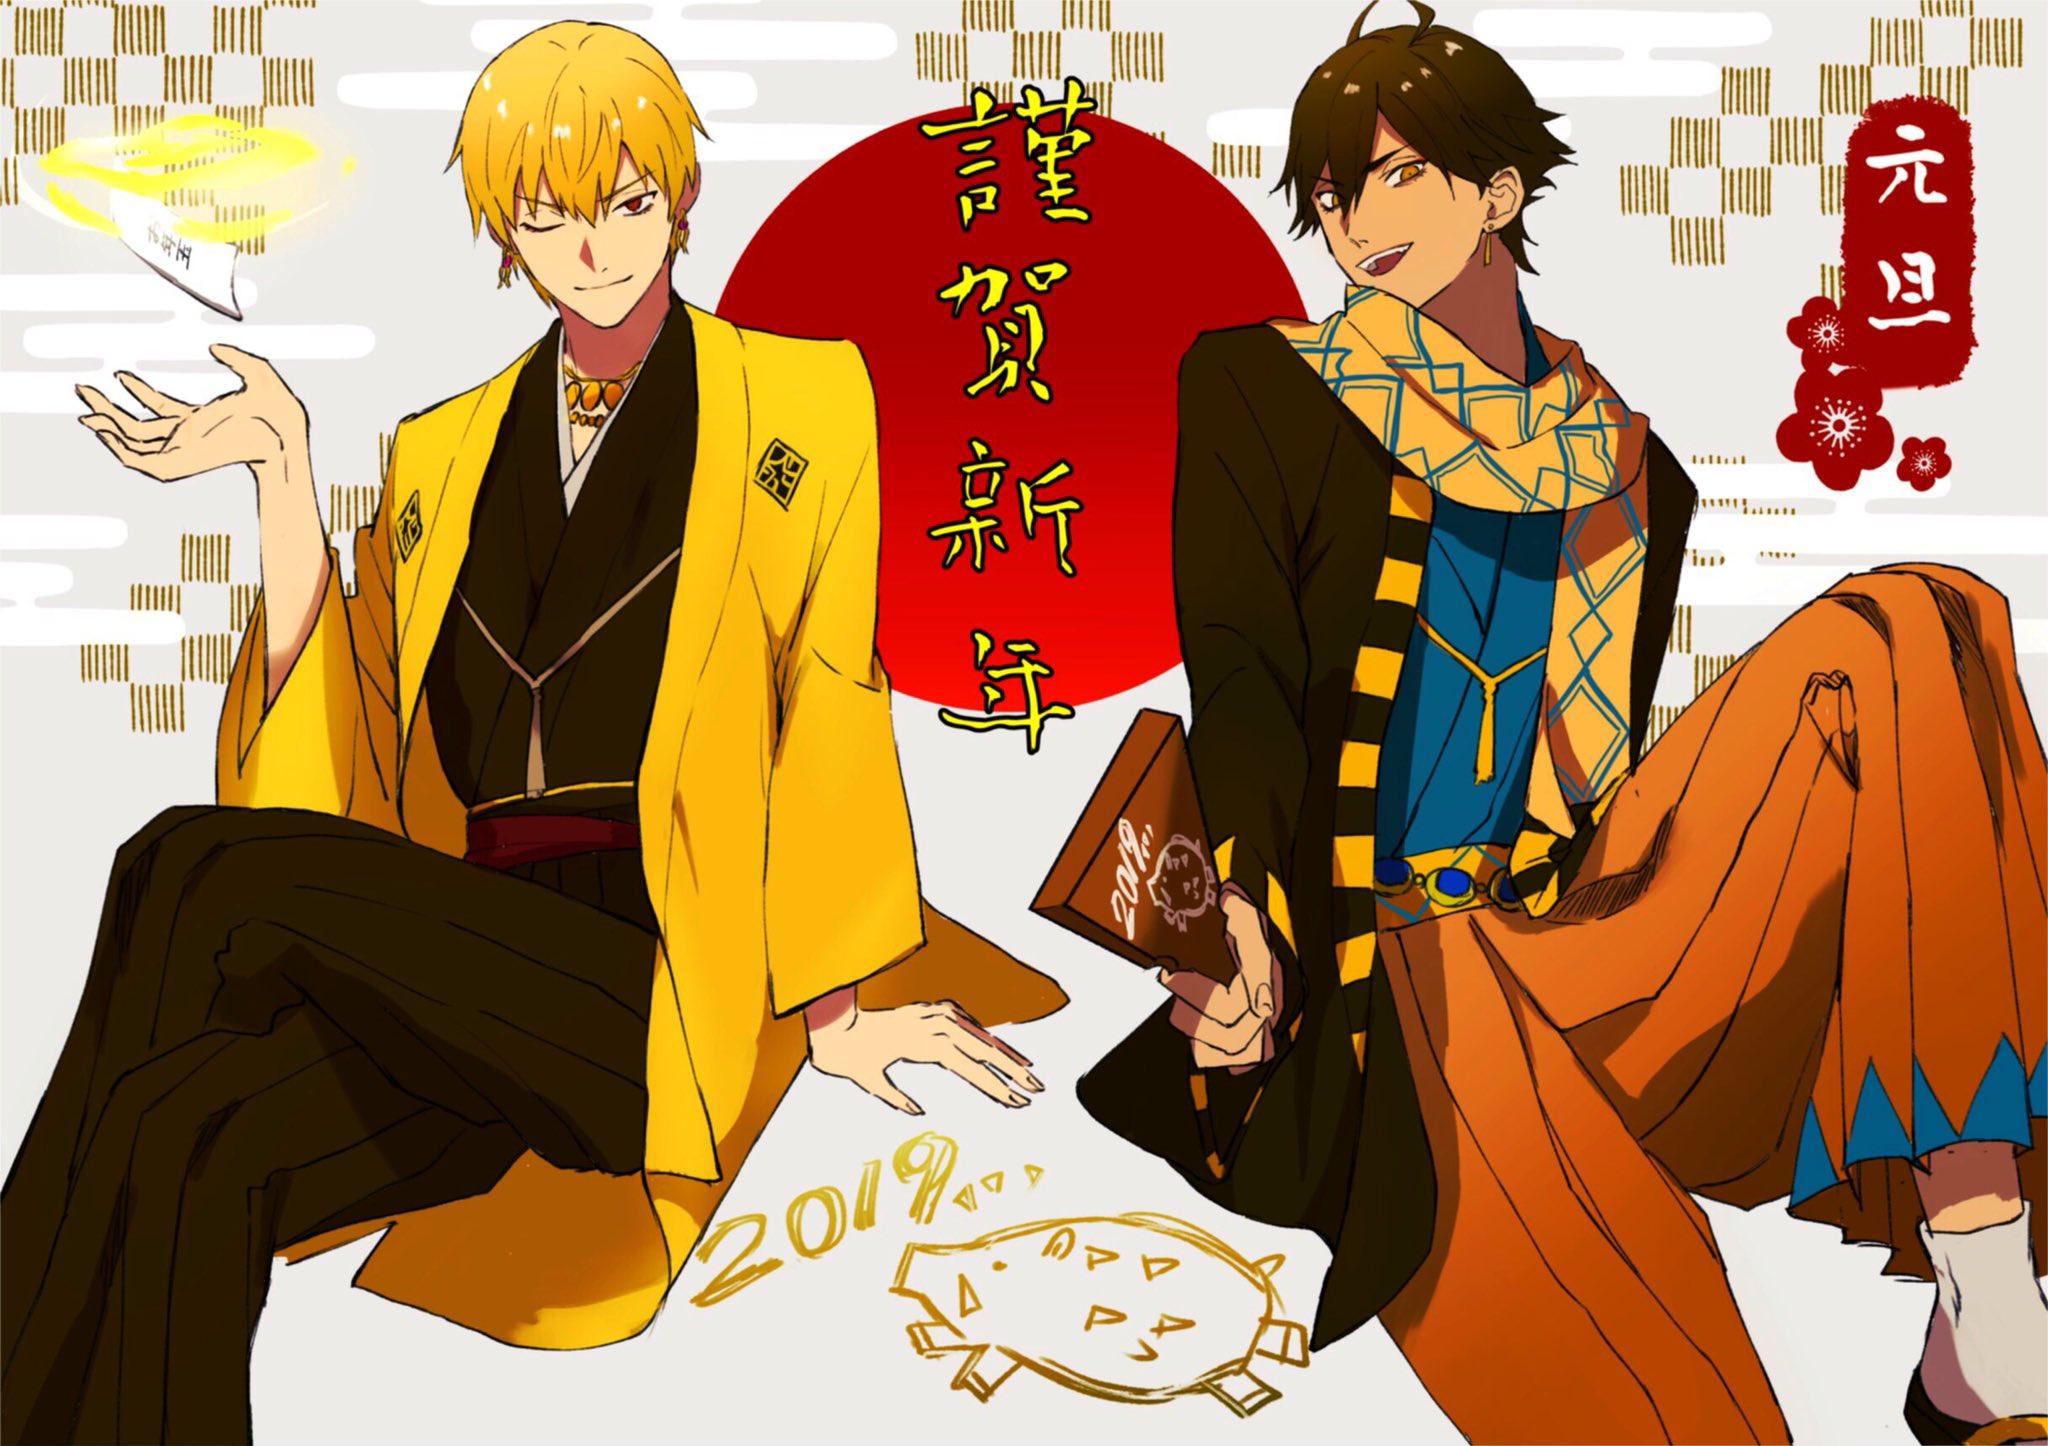 Fate/Grand Order Image #2464800 - Zerochan Anime Image Board